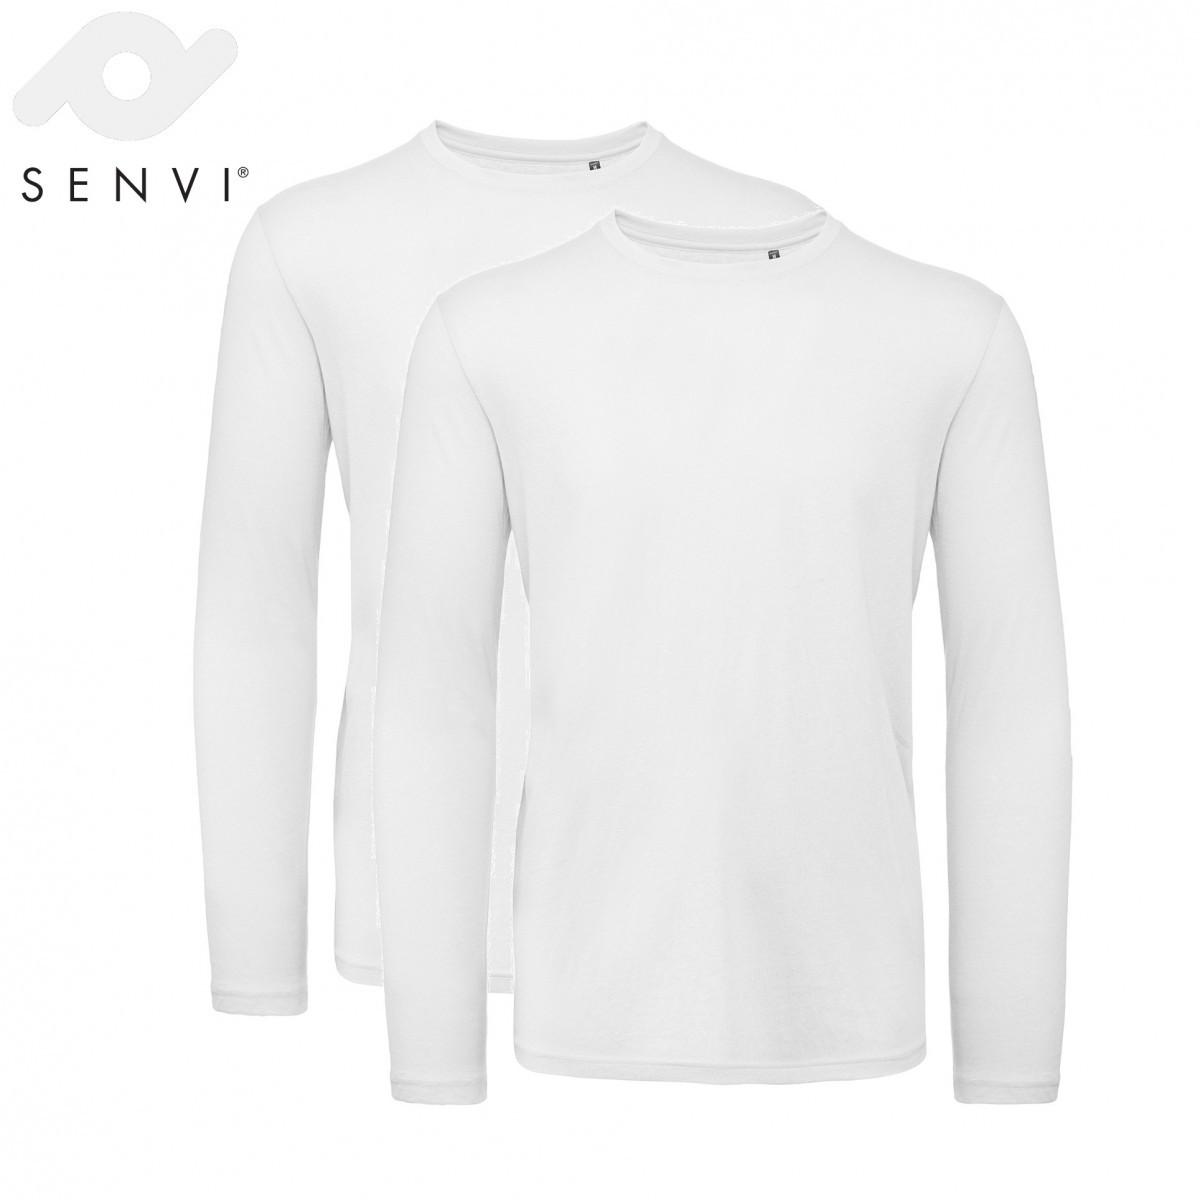 Senvi Basic T-shirt 2 pack Lange Mouwen Heren Wit Maat S (organisch katoen)